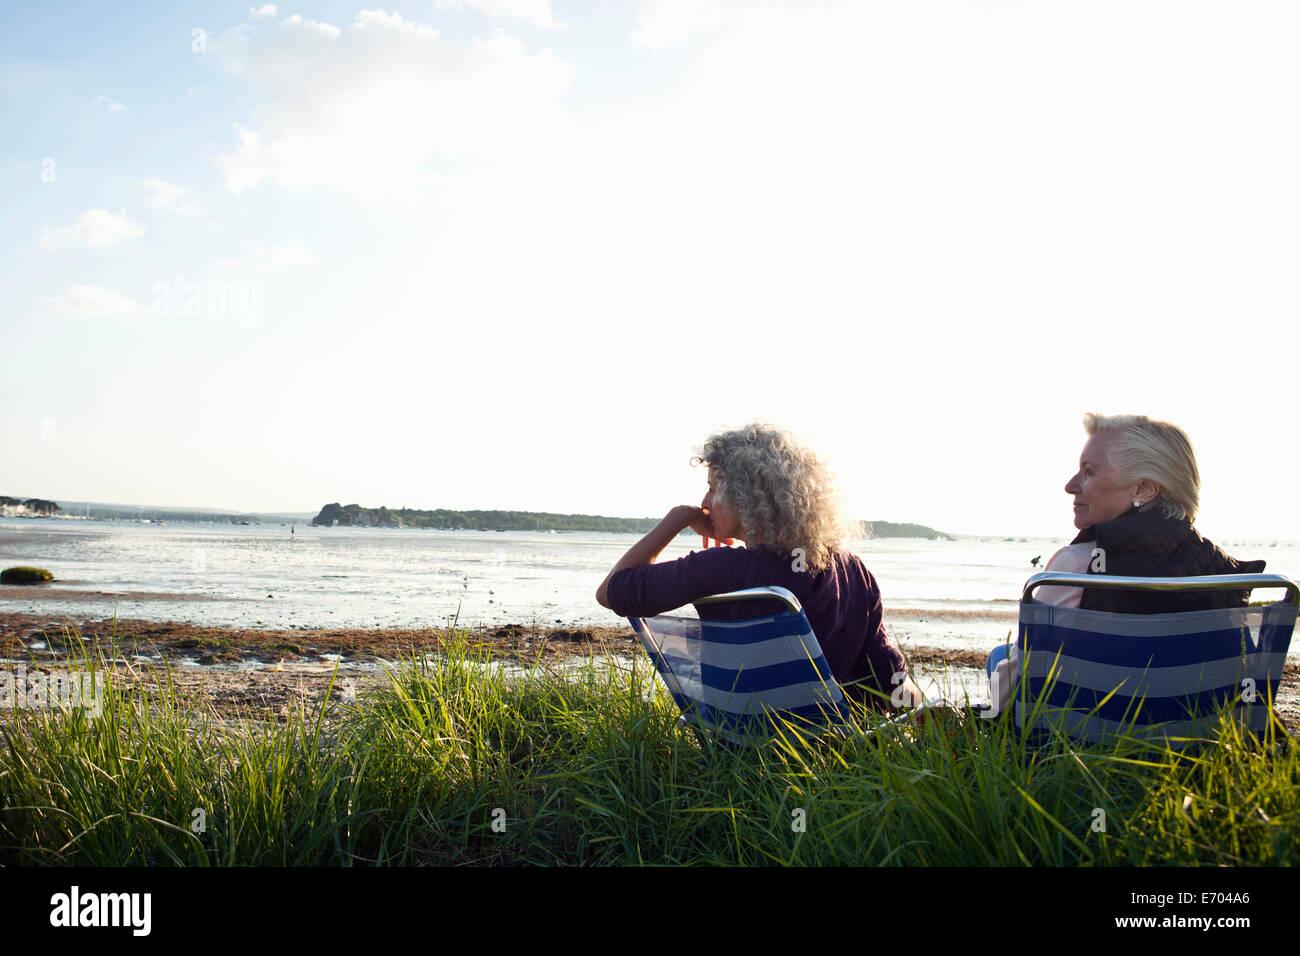 Mère et fille enjoying view on beach Photo Stock